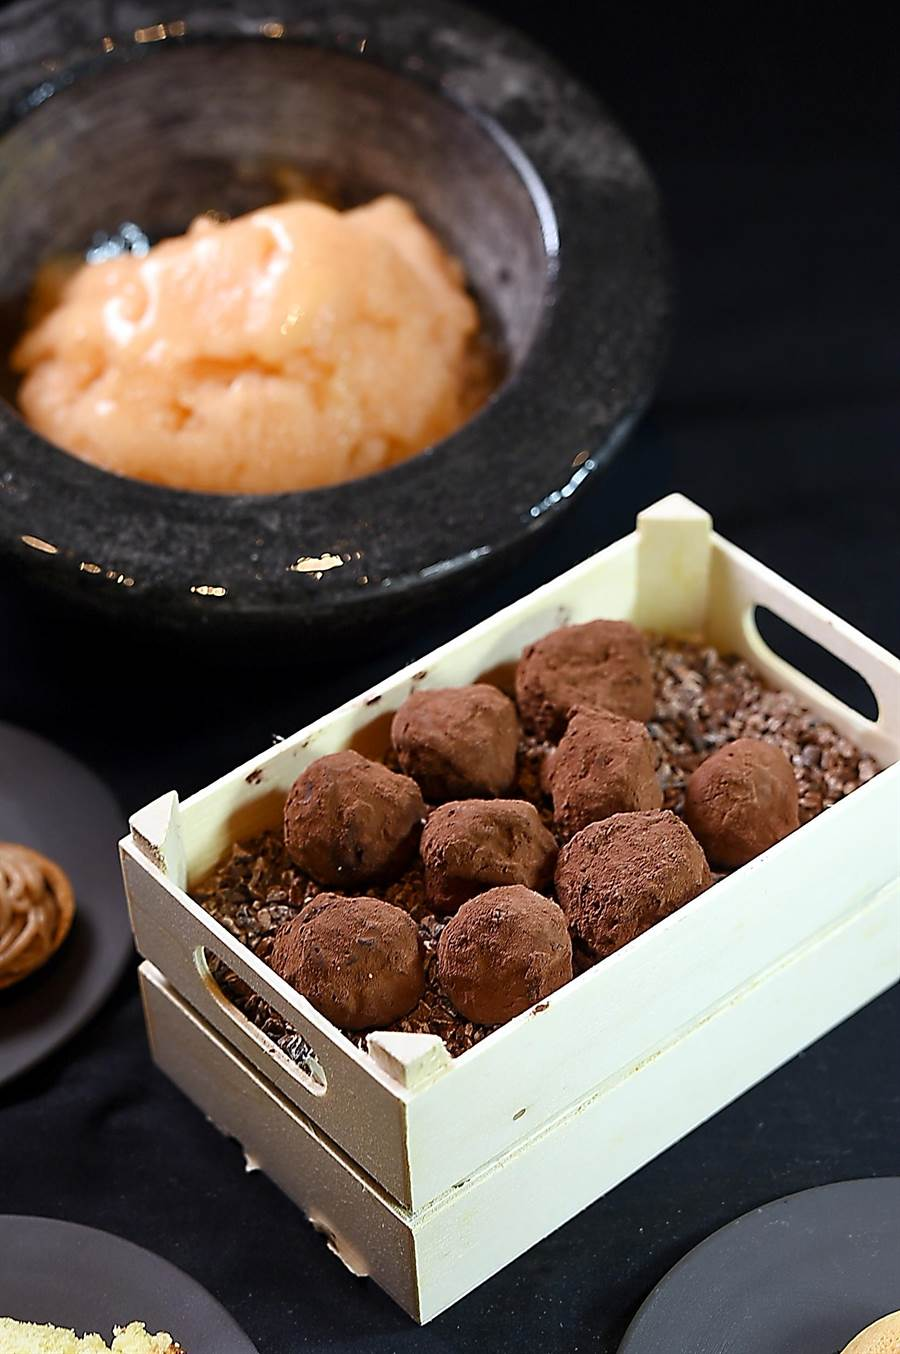 Jean-Remi Caillon客座微風信義〈Chefs Club Taipei〉,餐後佐咖啡小點也包括〈松露巧克力〉。(圖/姚舜)